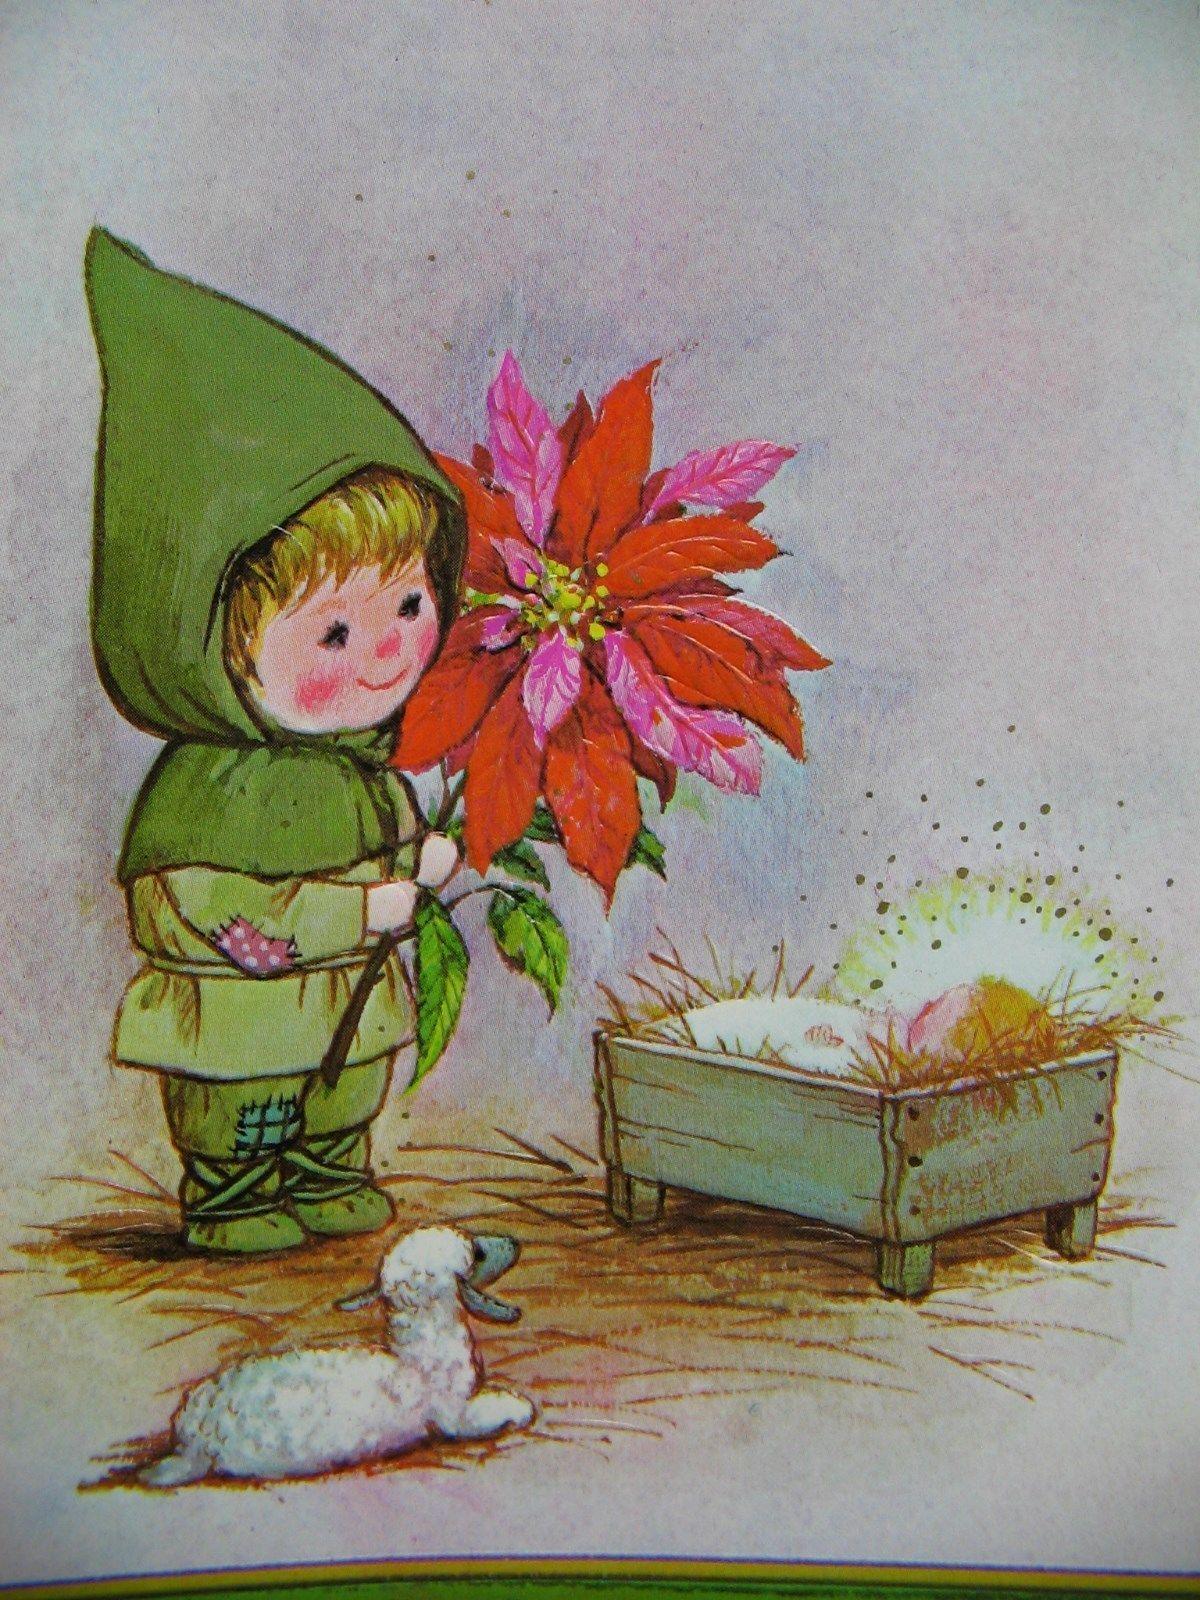 17 Vintage 1970s Drawing Board Gyo Fujikawa Christmas Cards Poinsettia Legend   eBay